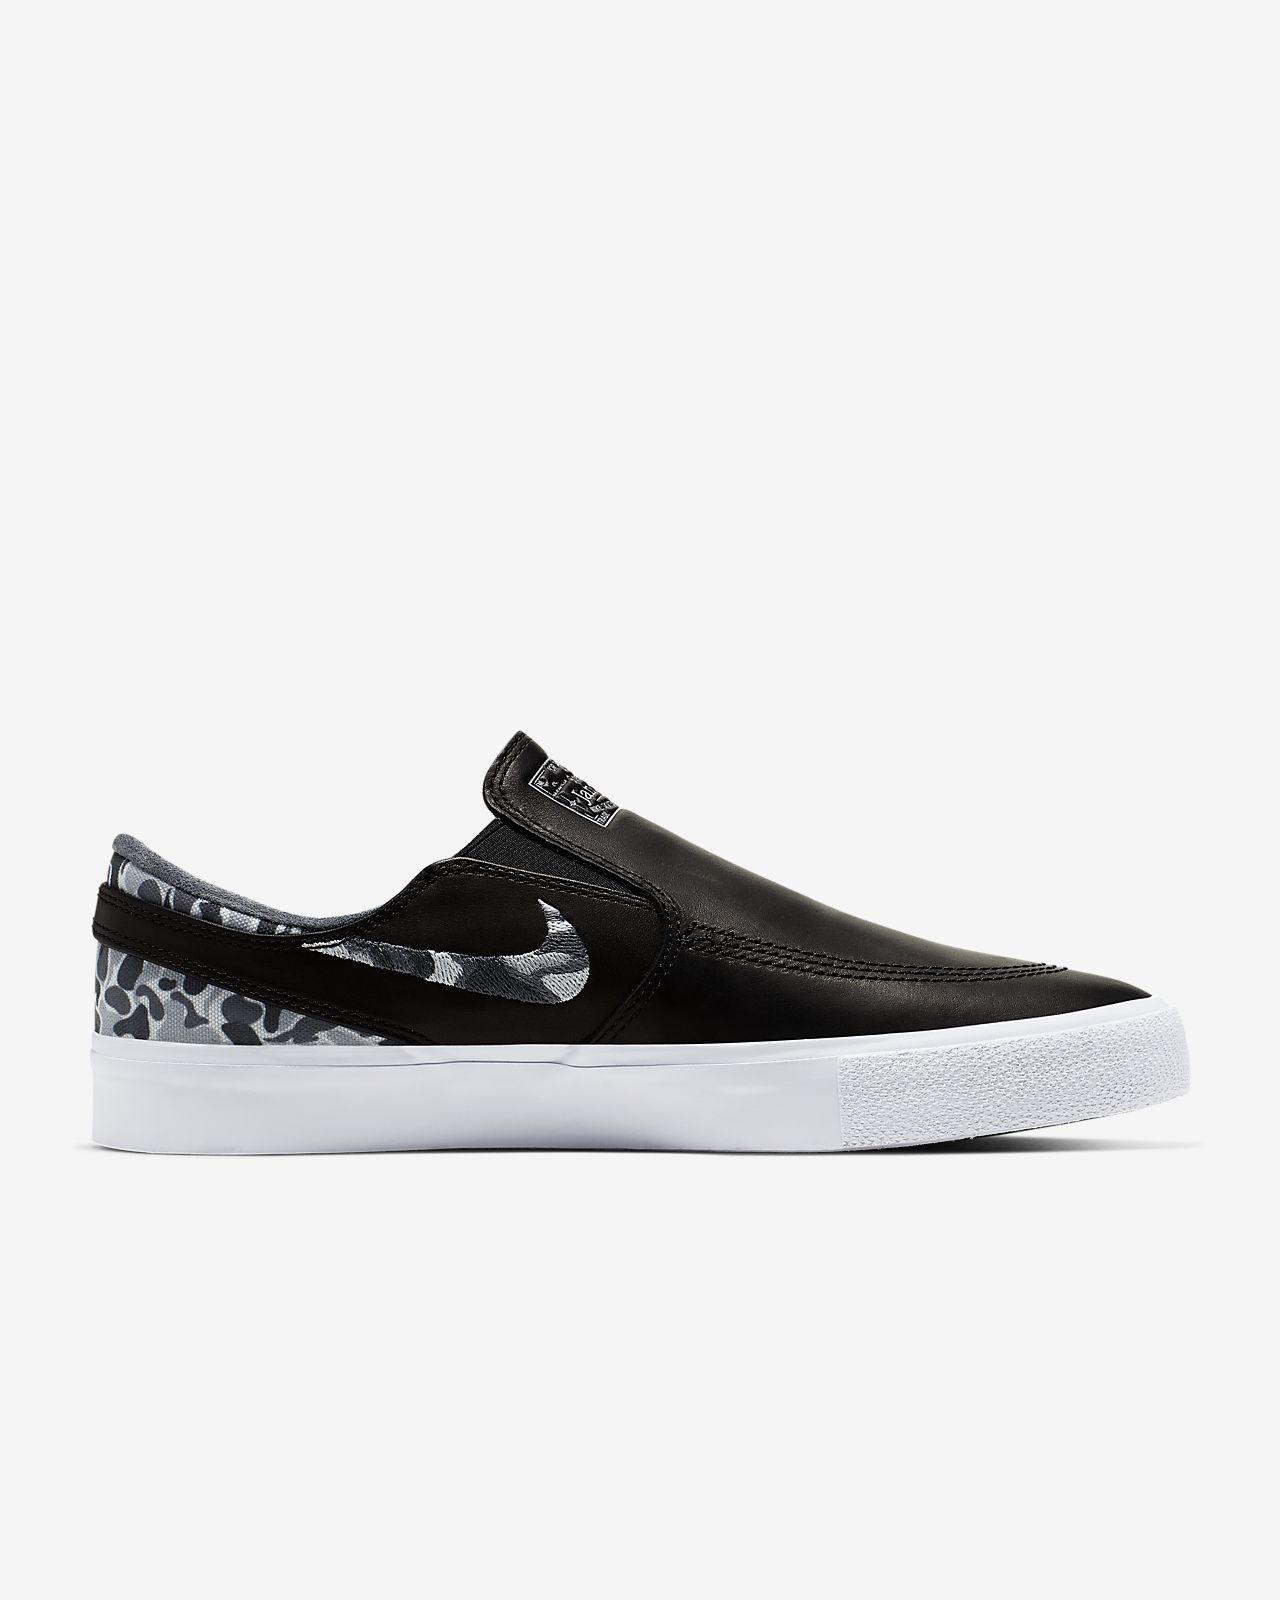 296dc056c9 Nike SB Zoom Stefan Janoski Slip RM Skate Shoe